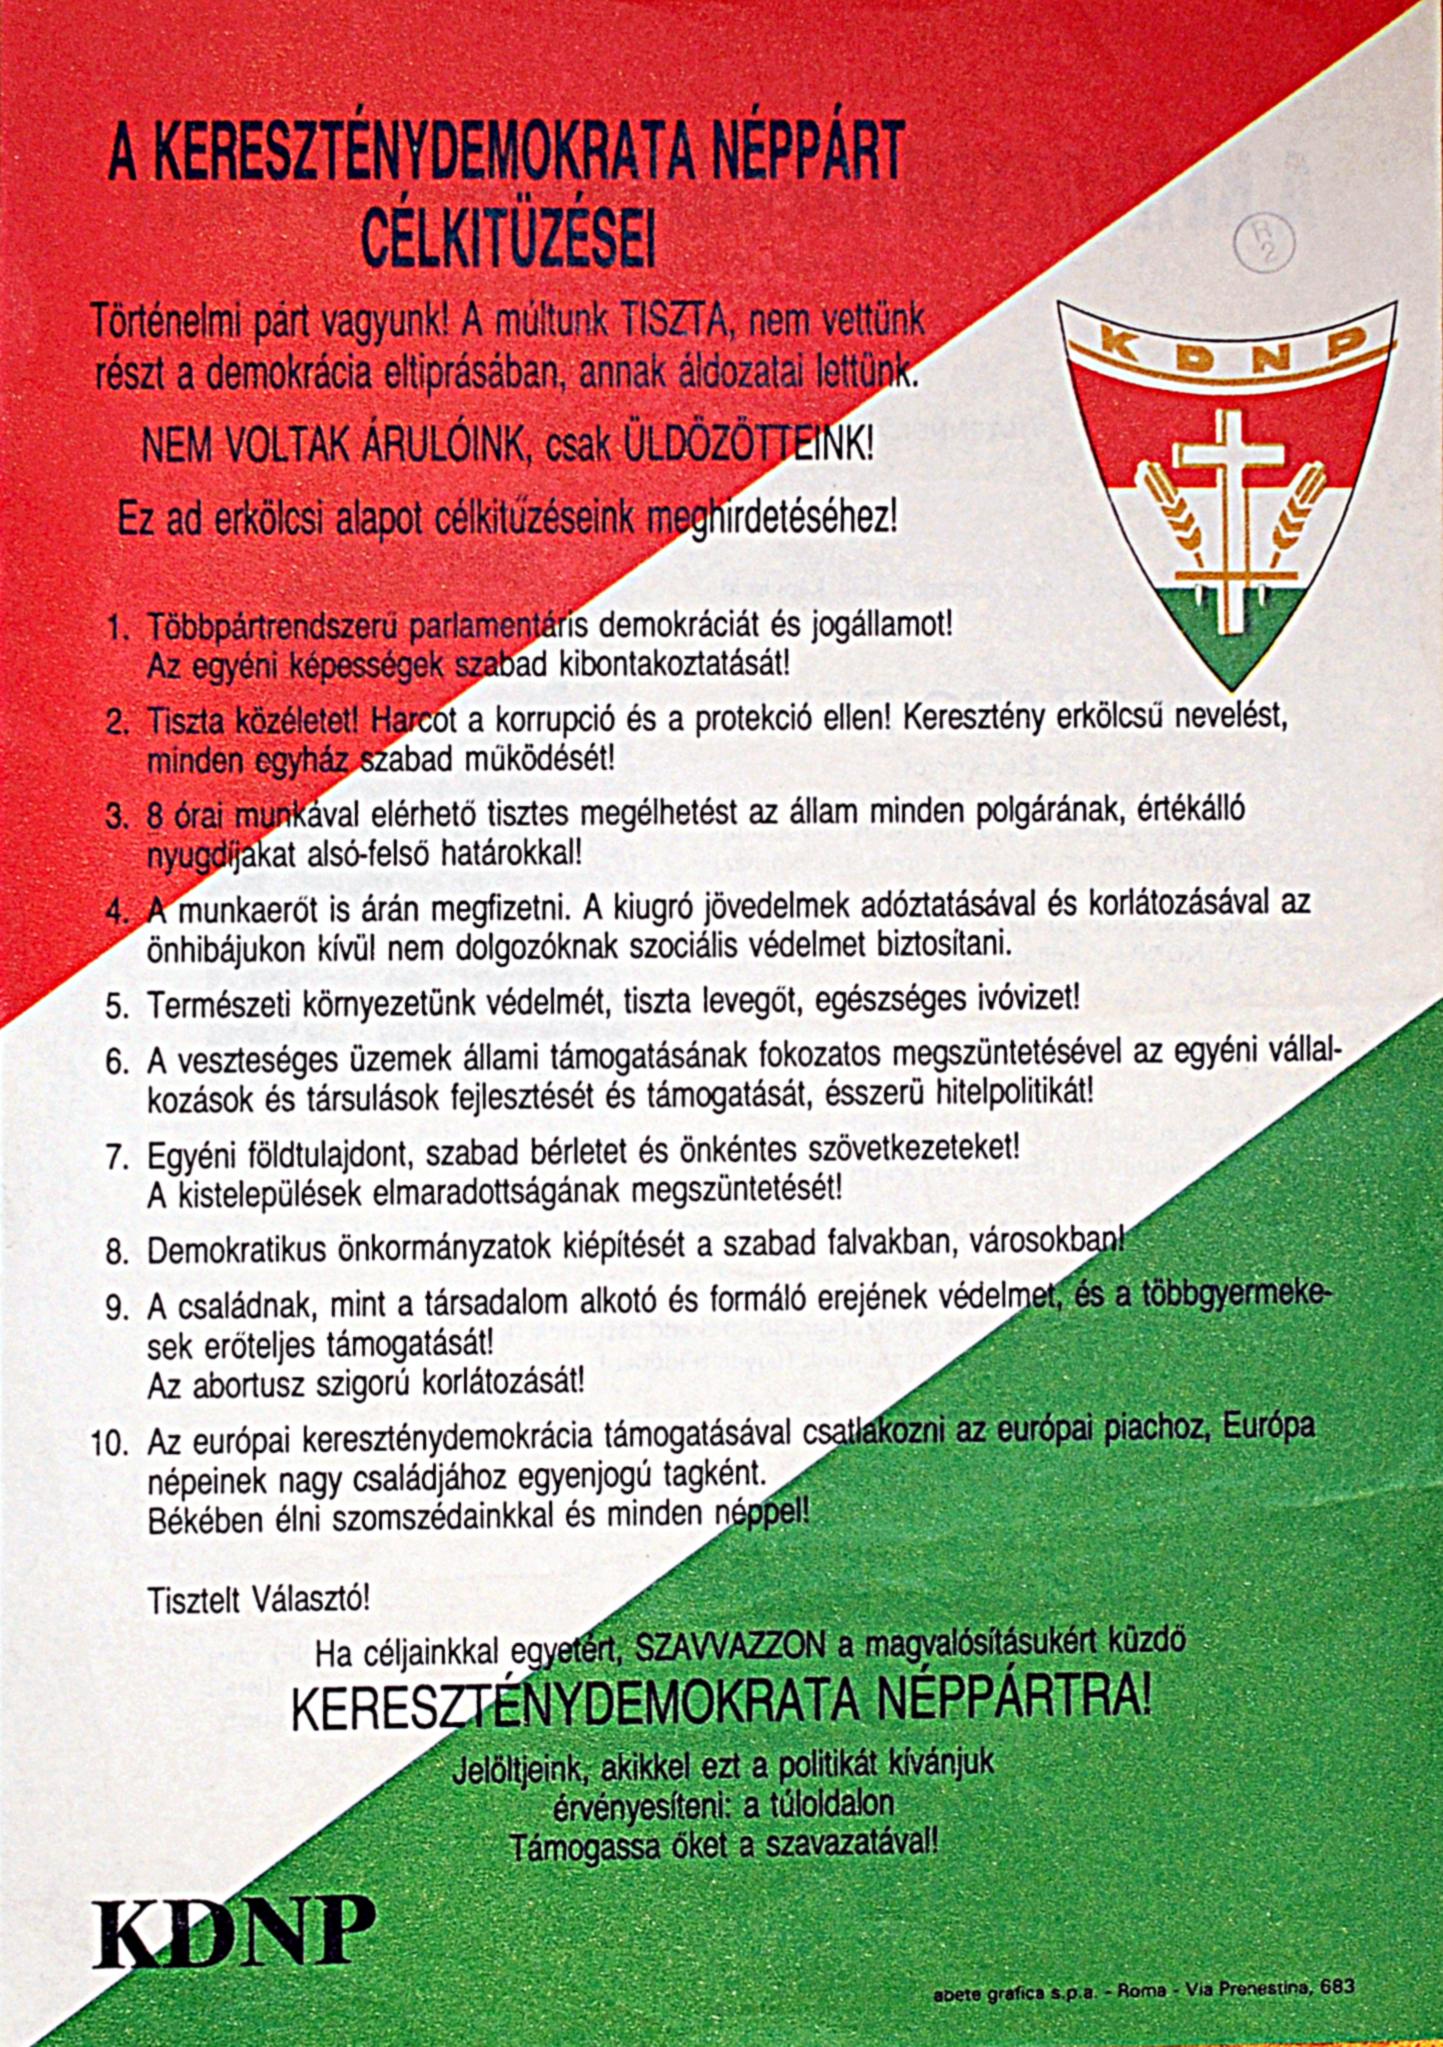 08_kdnp_nemzetikonyvtar.JPG